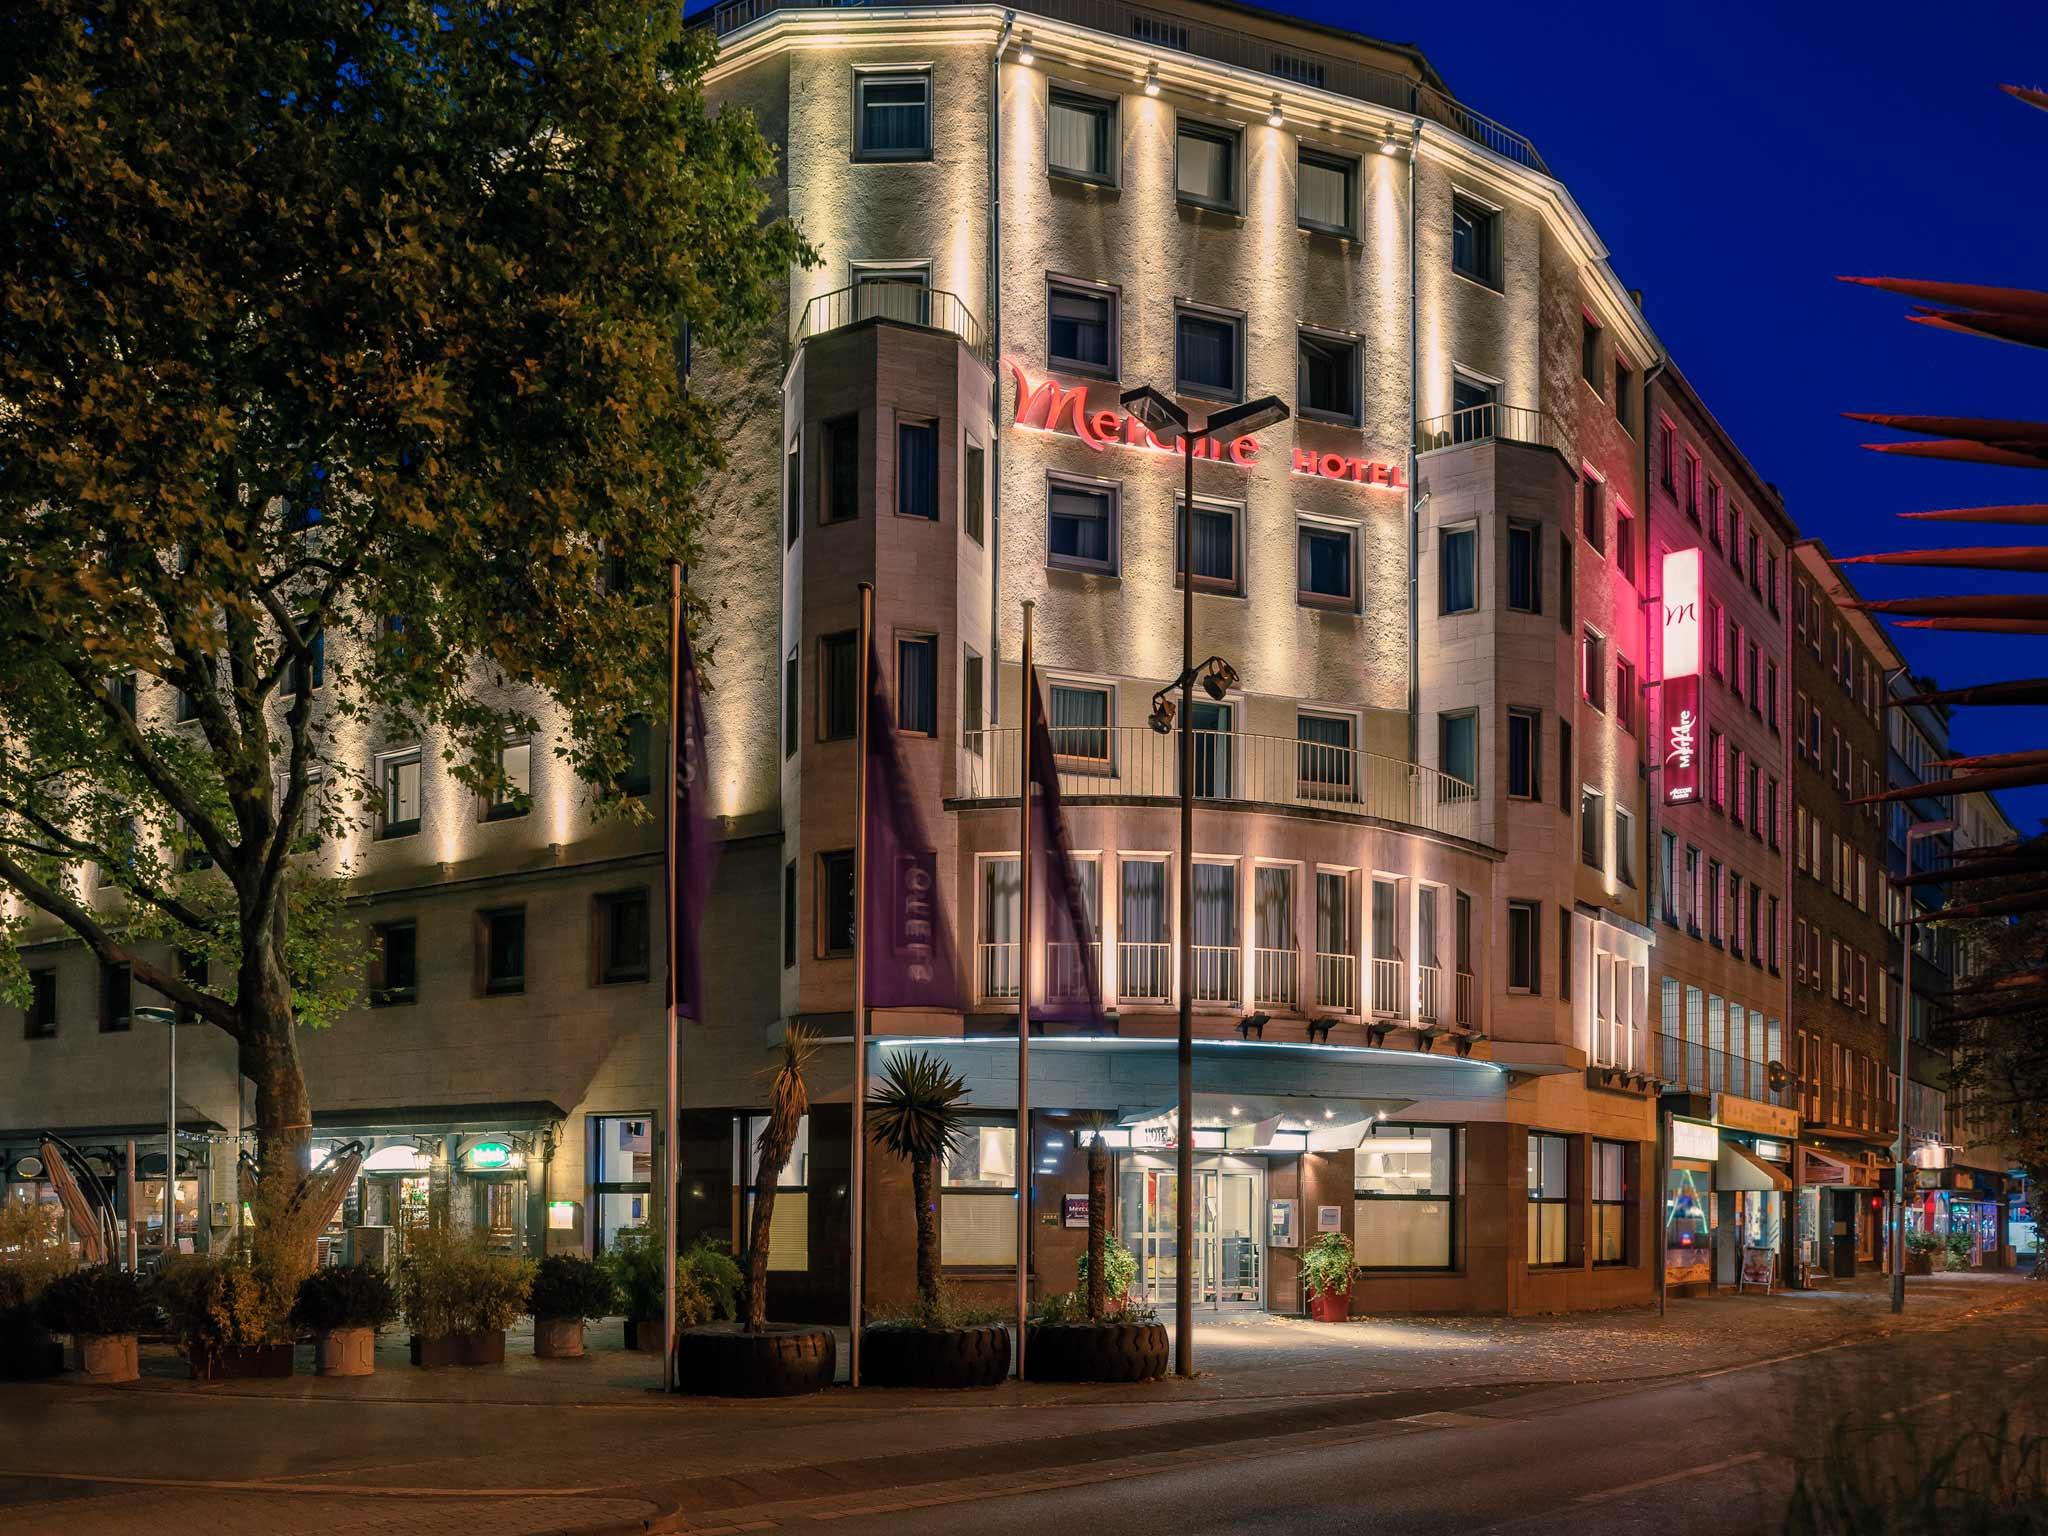 Mercure hotel duesseldorf city center book now free wifi for Hotel dusseldorf mit schwimmbad